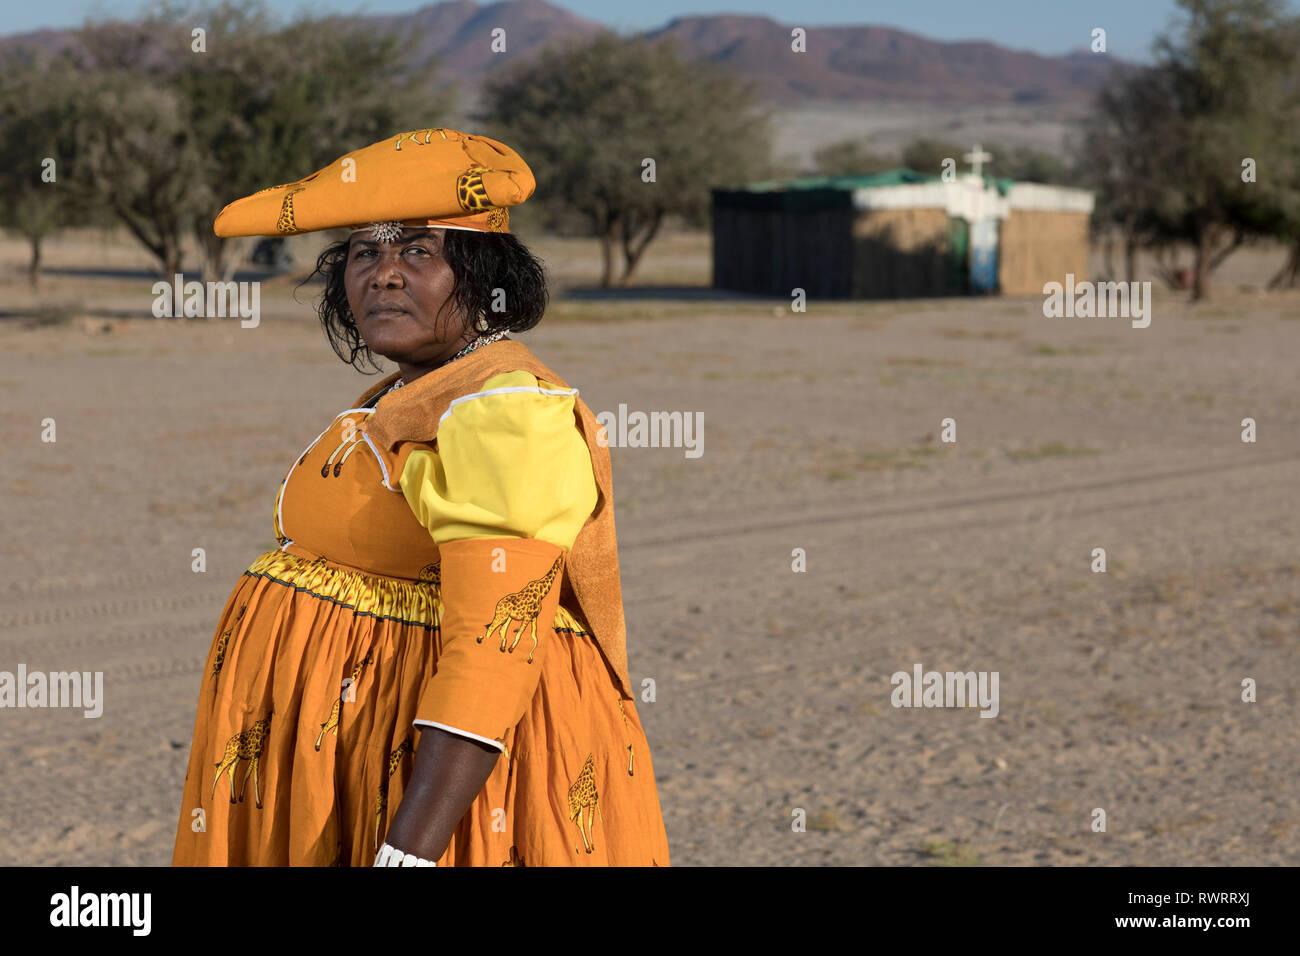 Portrait of a Herero lady taken in the Kunene Region of Namibia. - Stock Image